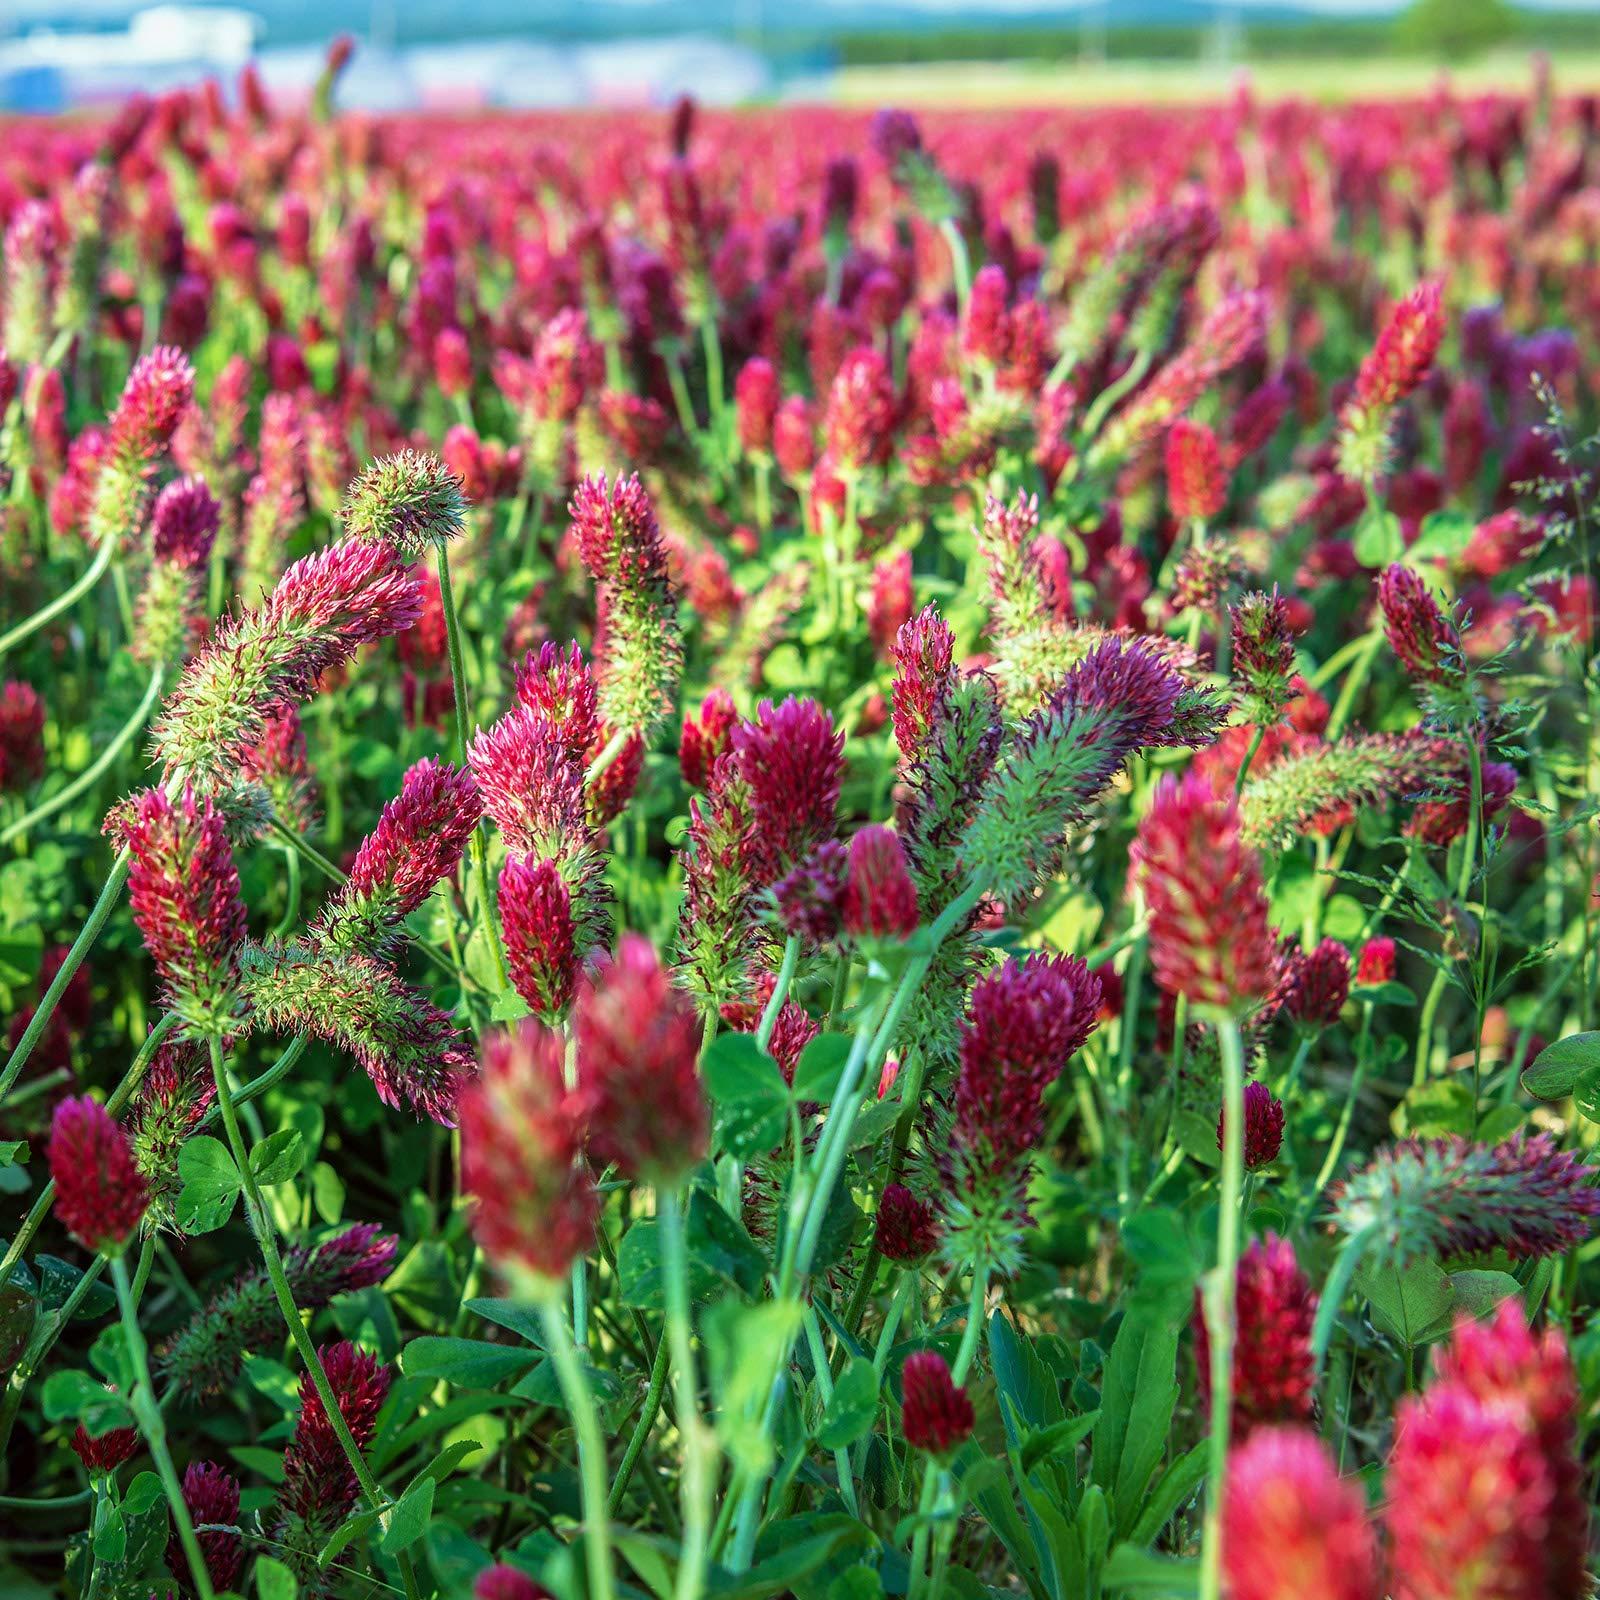 Crimson Clover Seeds - 50 Lb Bulk, Farm & Garden Cover Crop, Non-GMO, Open Pollinated, Perennial, Heirloom - Pelleted & Inoculated w/Nitrogen Fixing Bacteria by Mountain Valley Seed Company